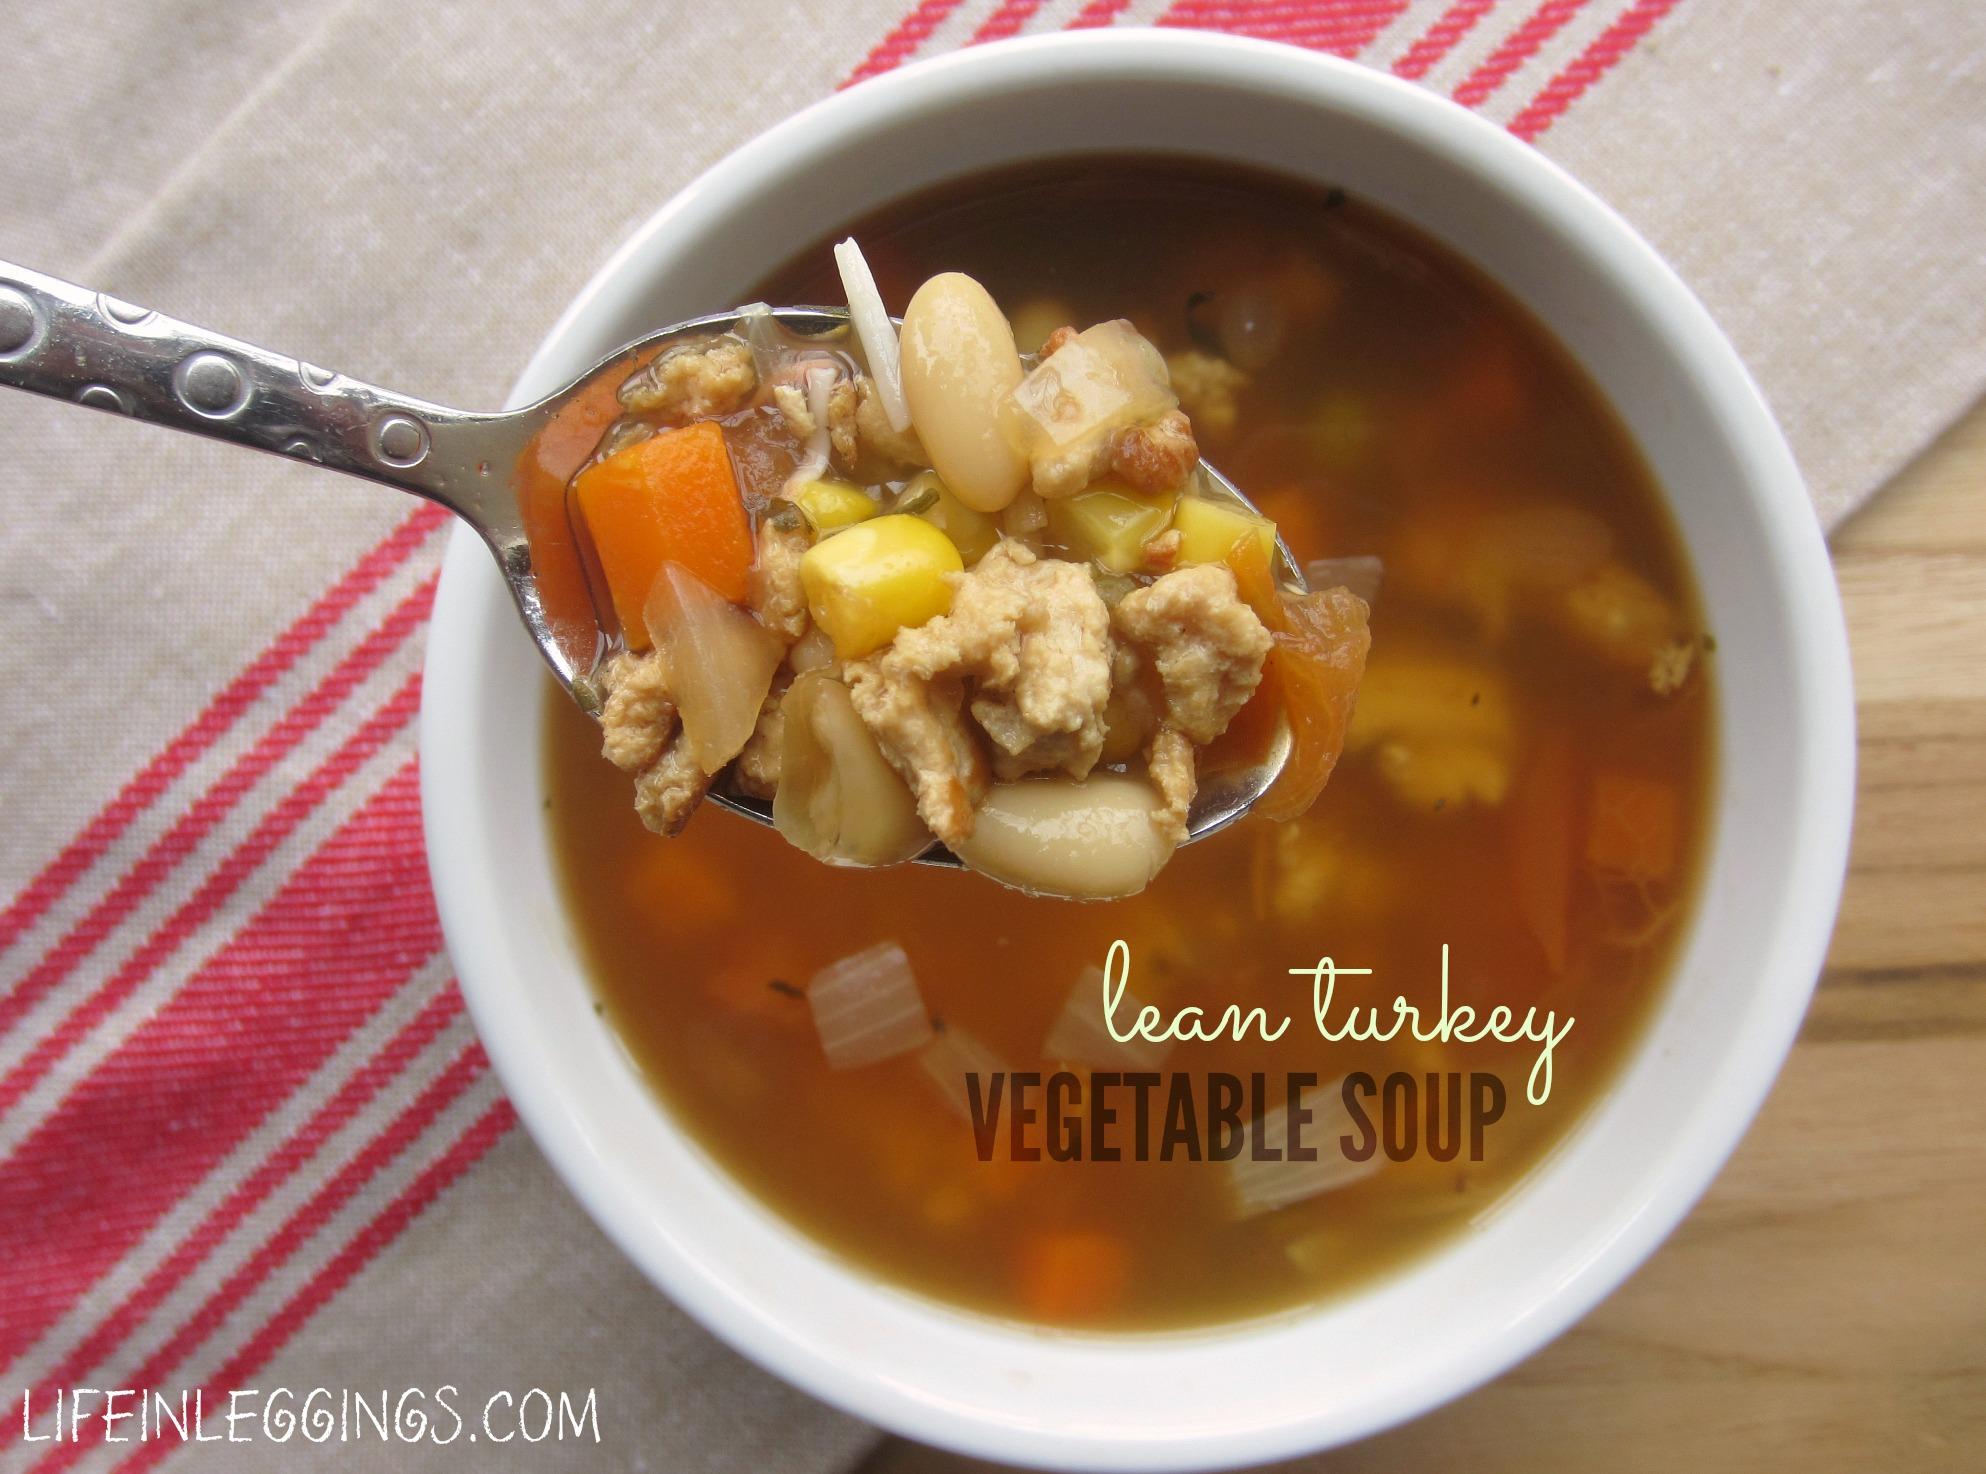 lean turkey mixed vegetable soup